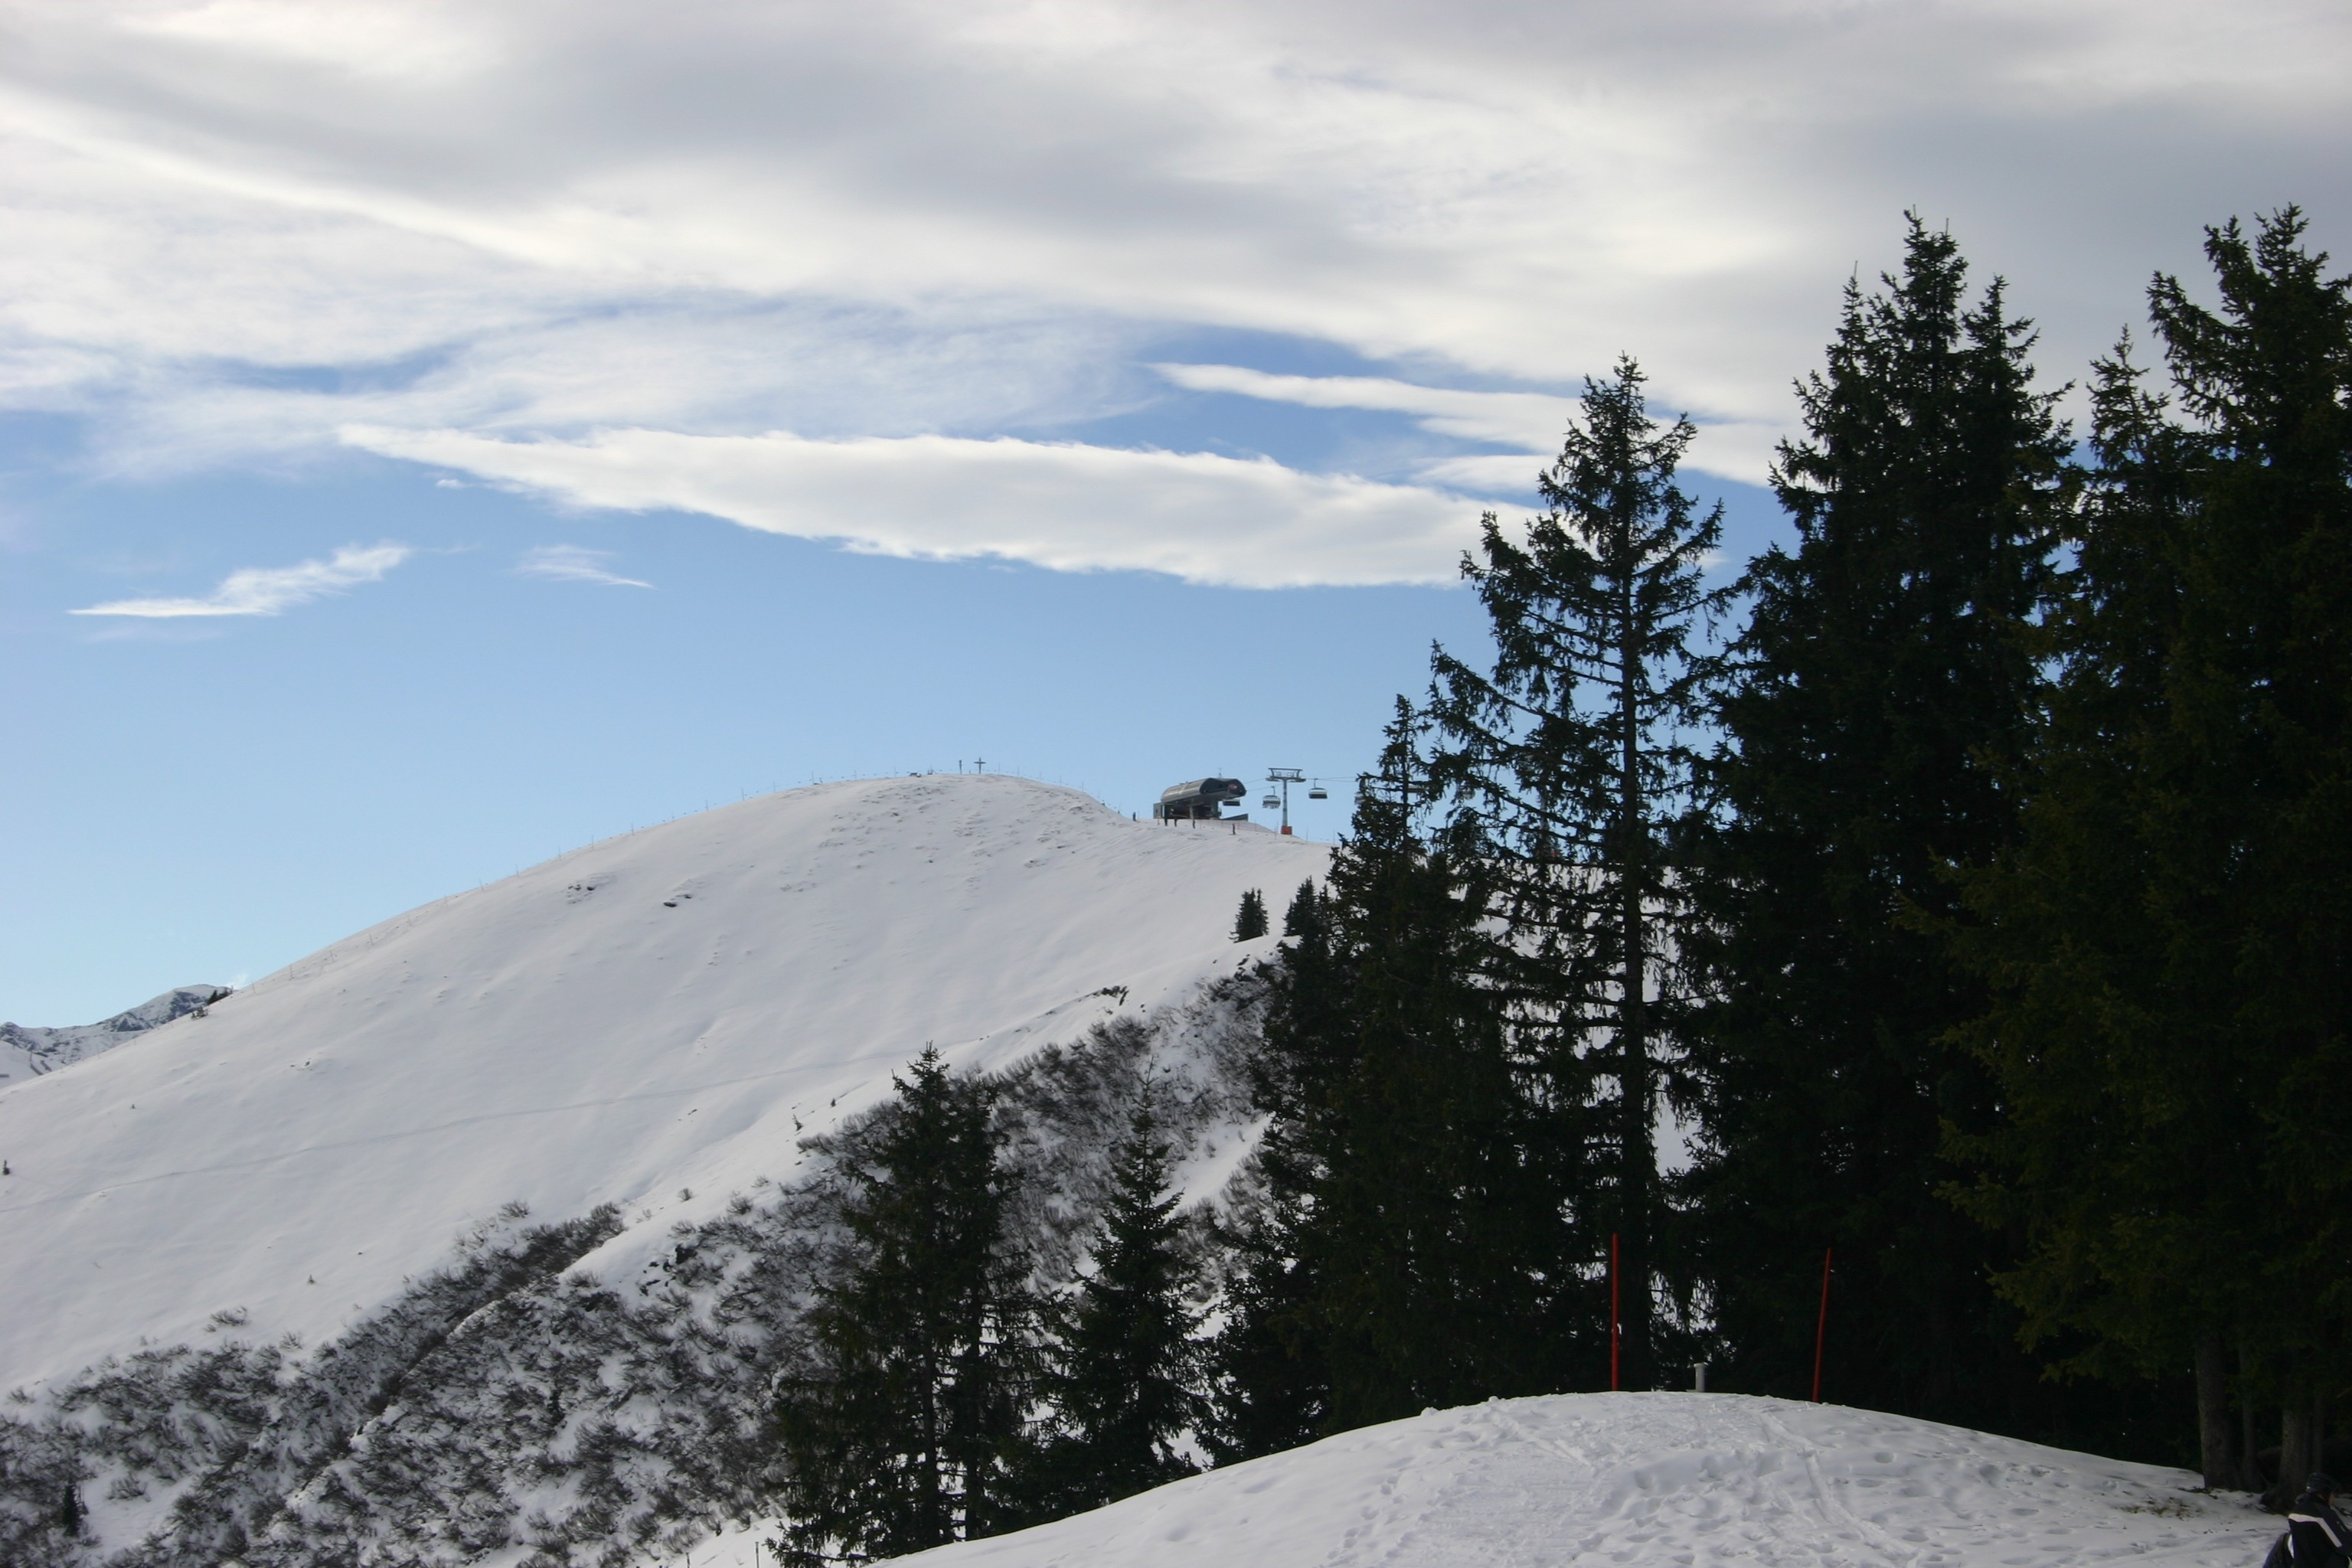 Skicircus Saalbach Hinterglemm Leogang 068 - Dag 2